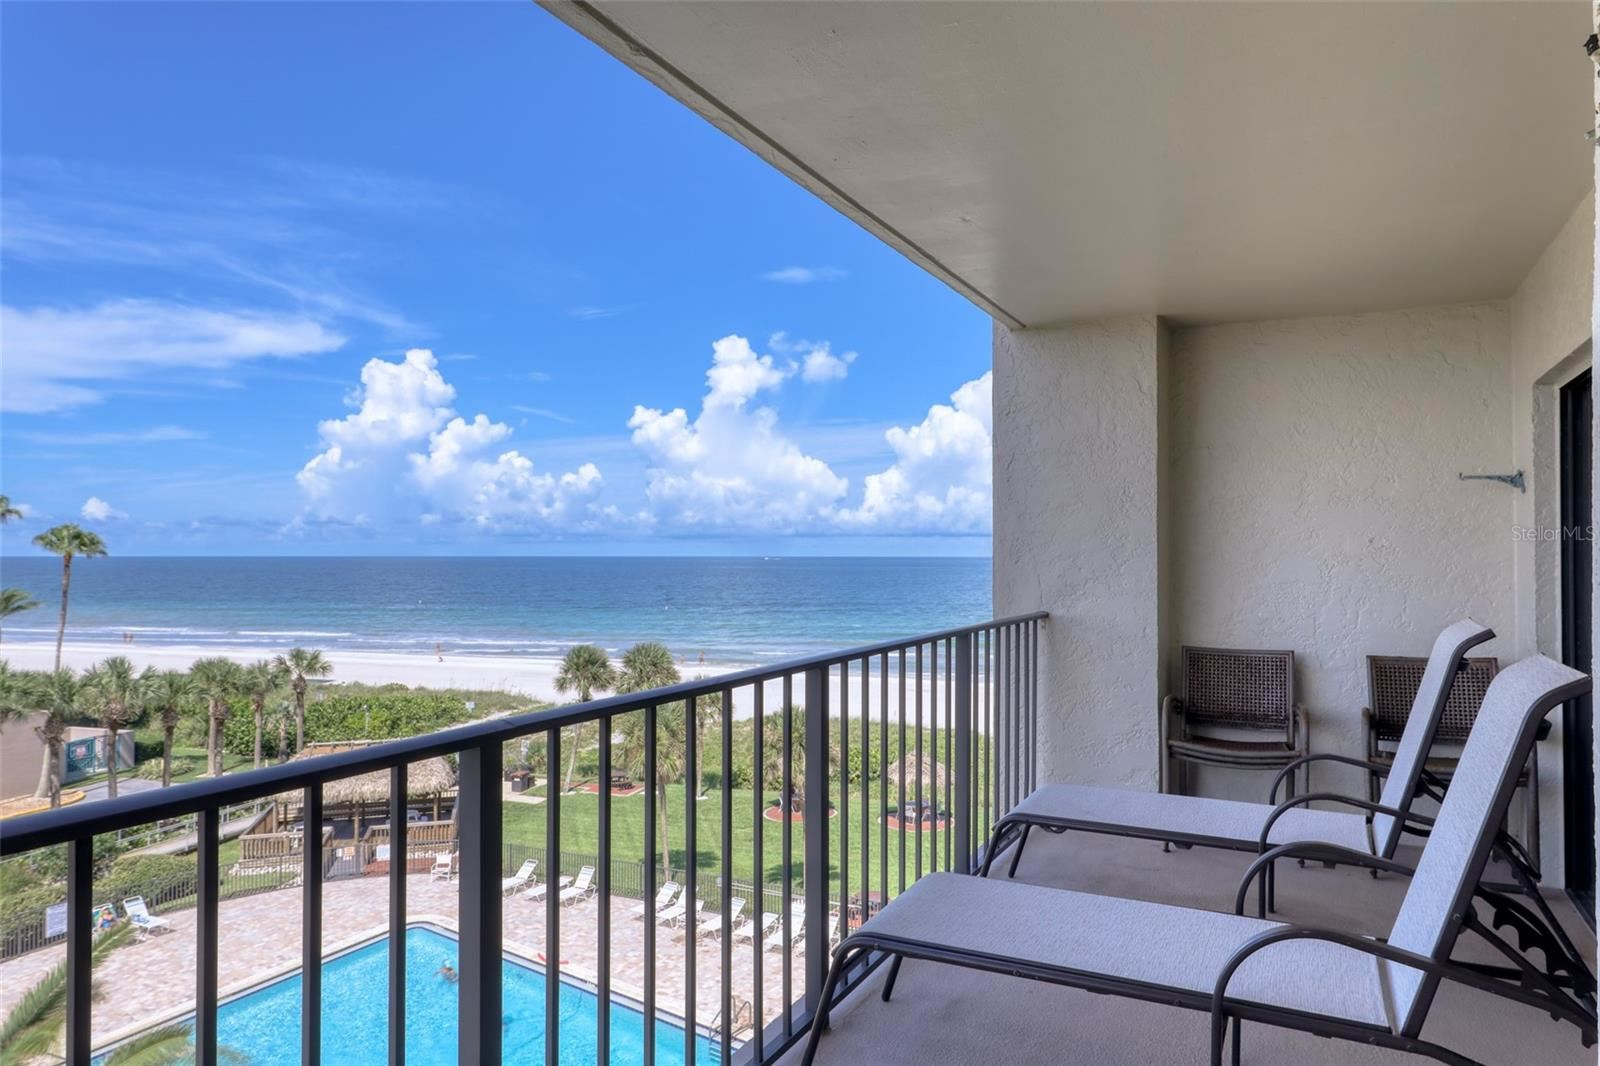 1480 GULF BOULEVARD #401, Clearwater, FL 33767 - #: U8125543